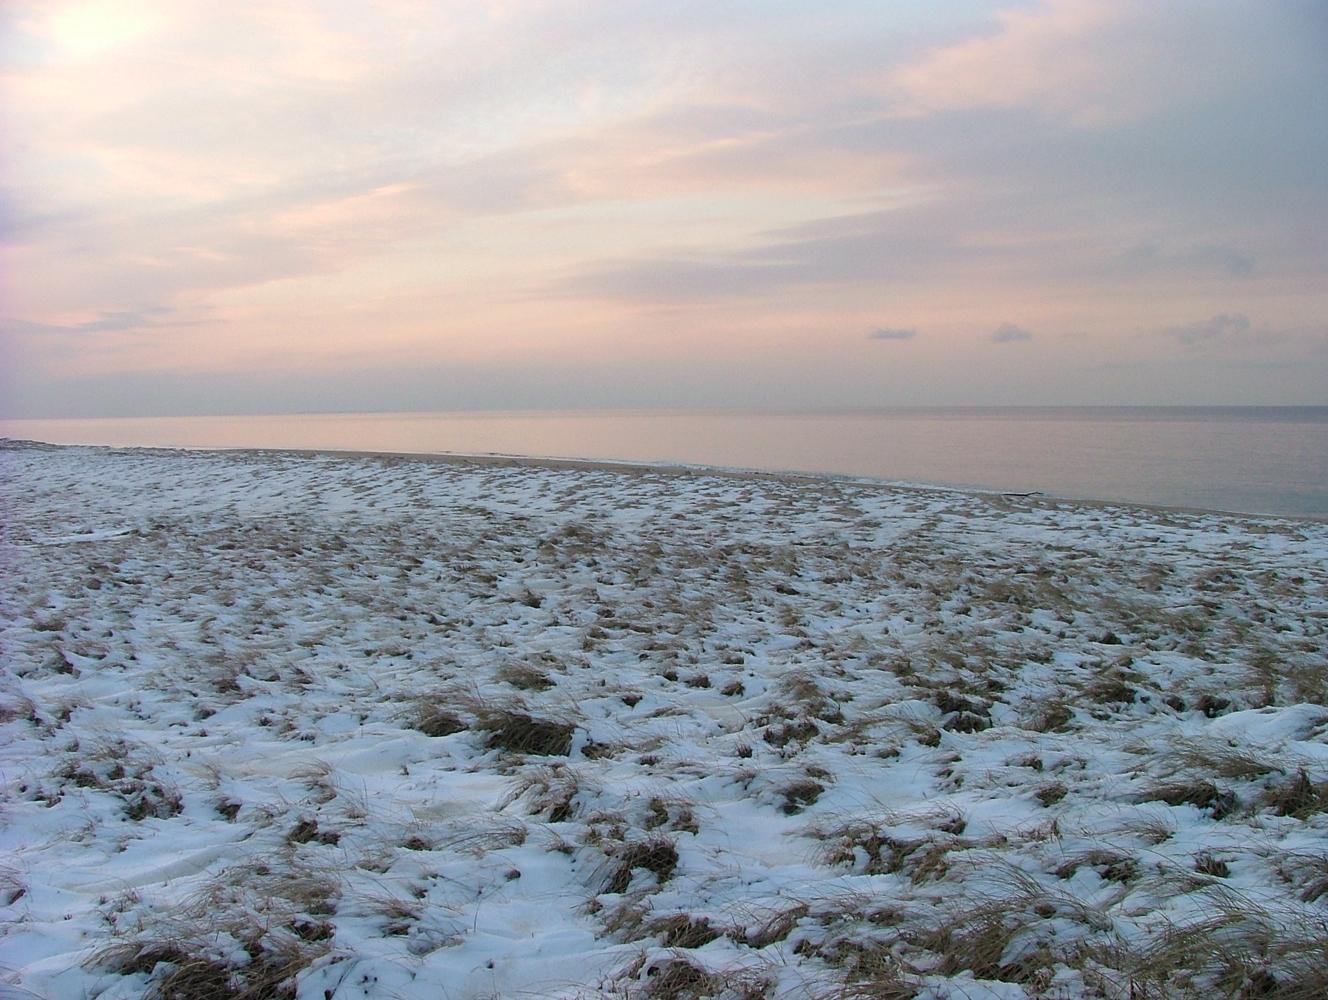 Snow coats the Race Point dunes.